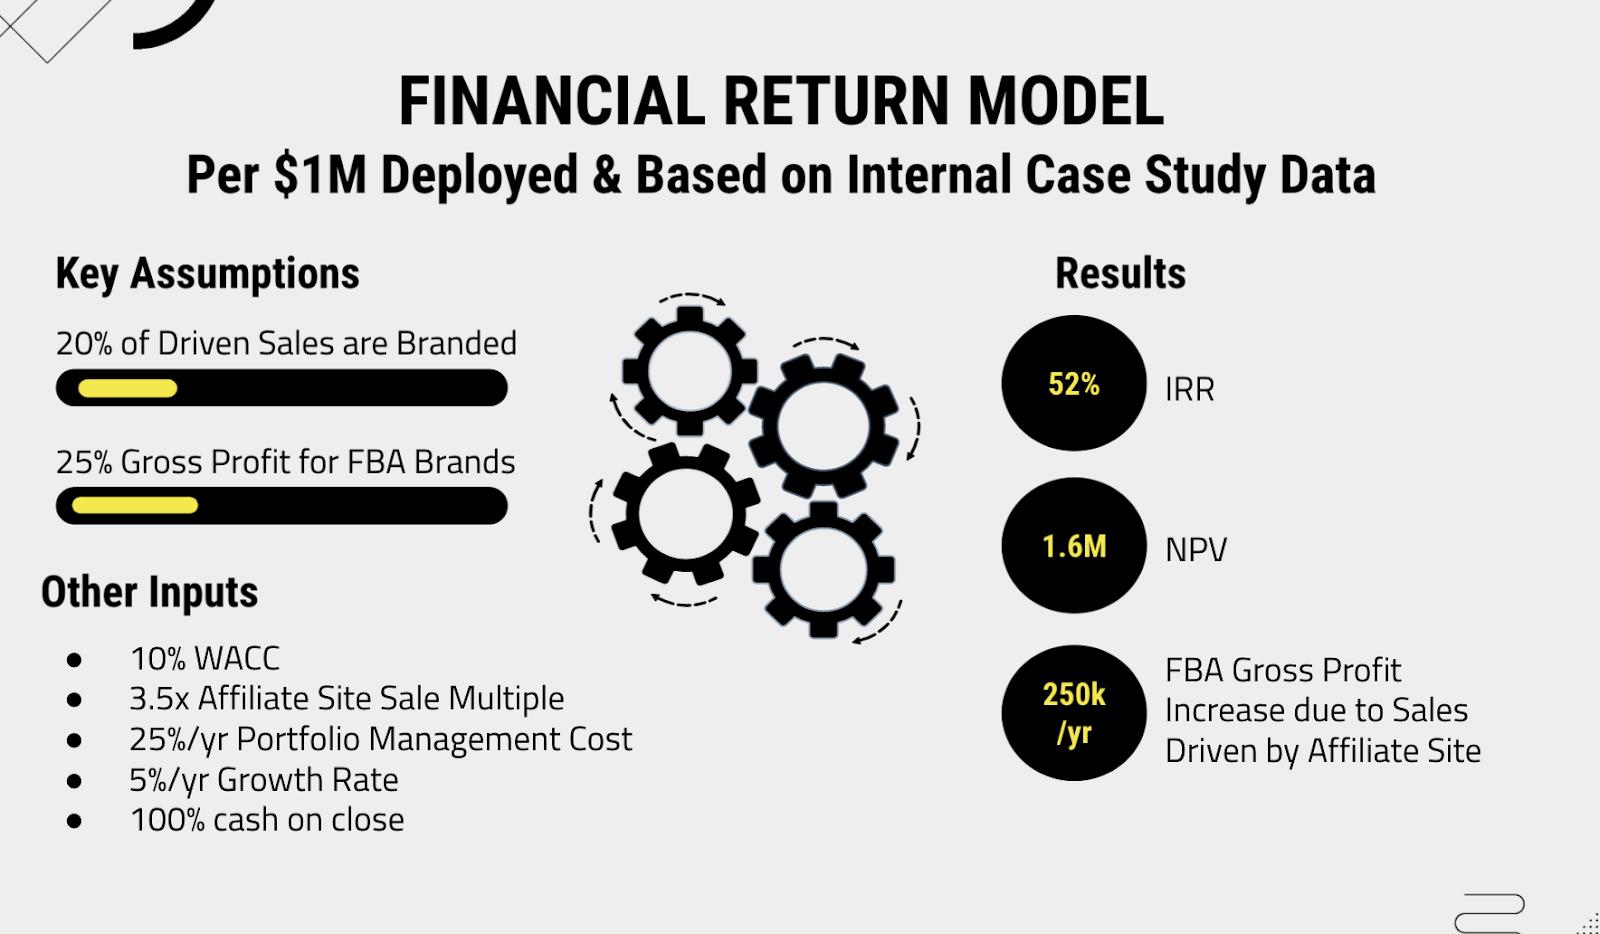 Business Case for Amazon FBA Aggregators to Acquire Amazon Affiliate Sites - IRR over 50% Case Study Data